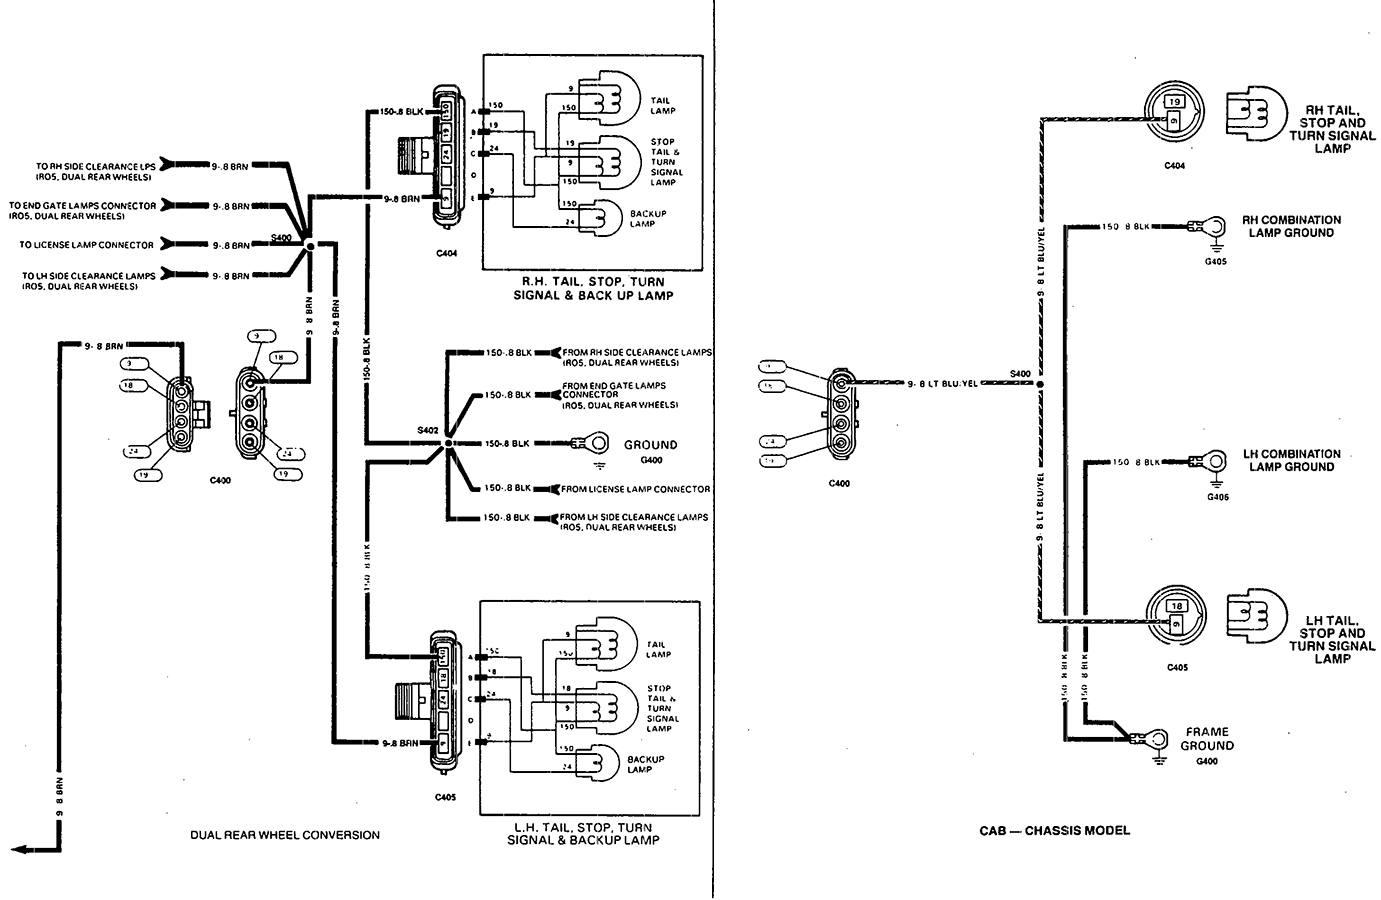 Wiring Diagram 2000 Chevy Silverado - Wiring Diagram Data - Light Wiring Diagram